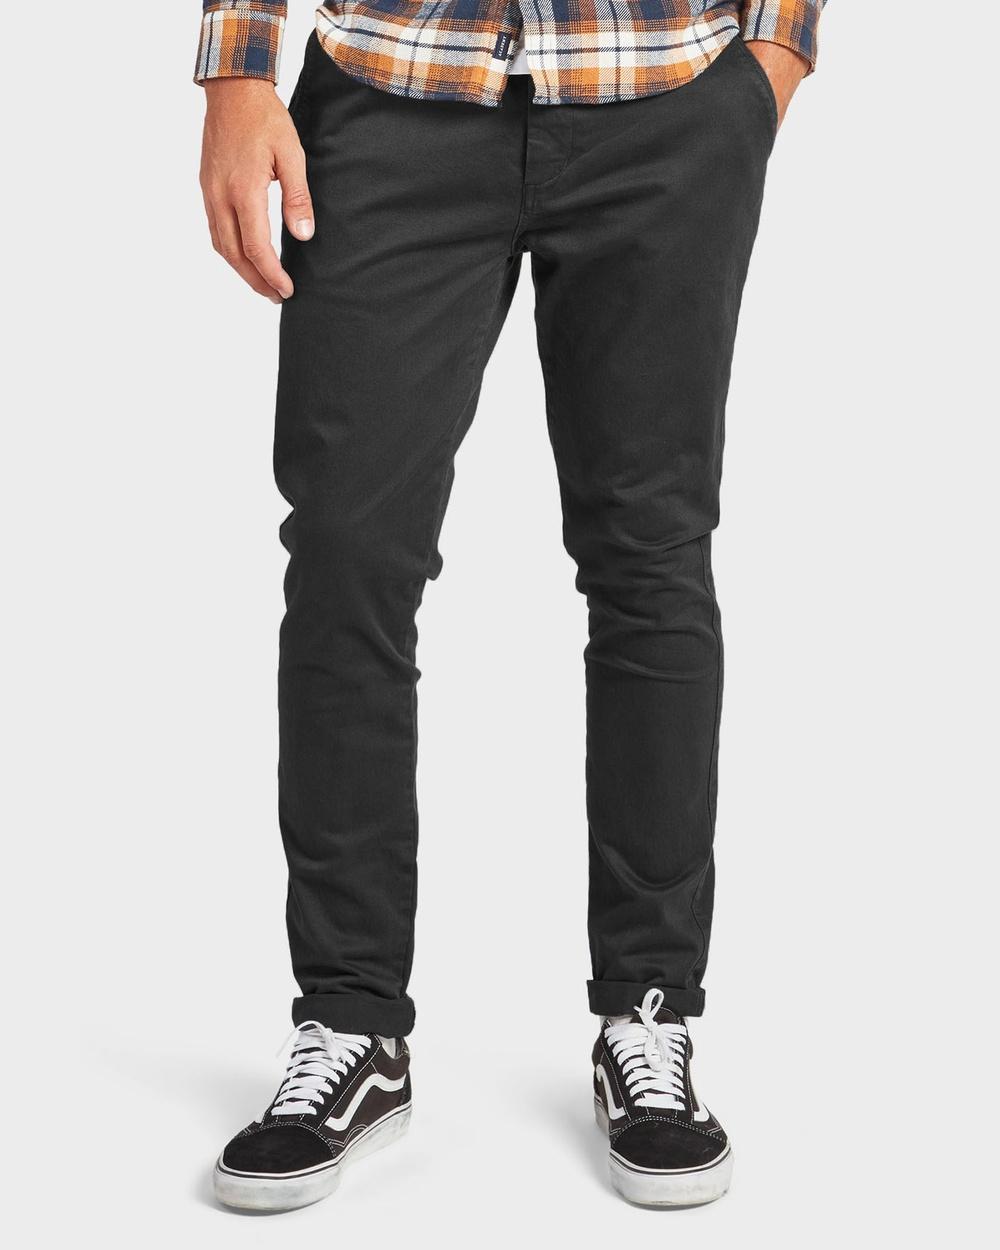 Academy Brand Skinny Stretch Chino Pants Black